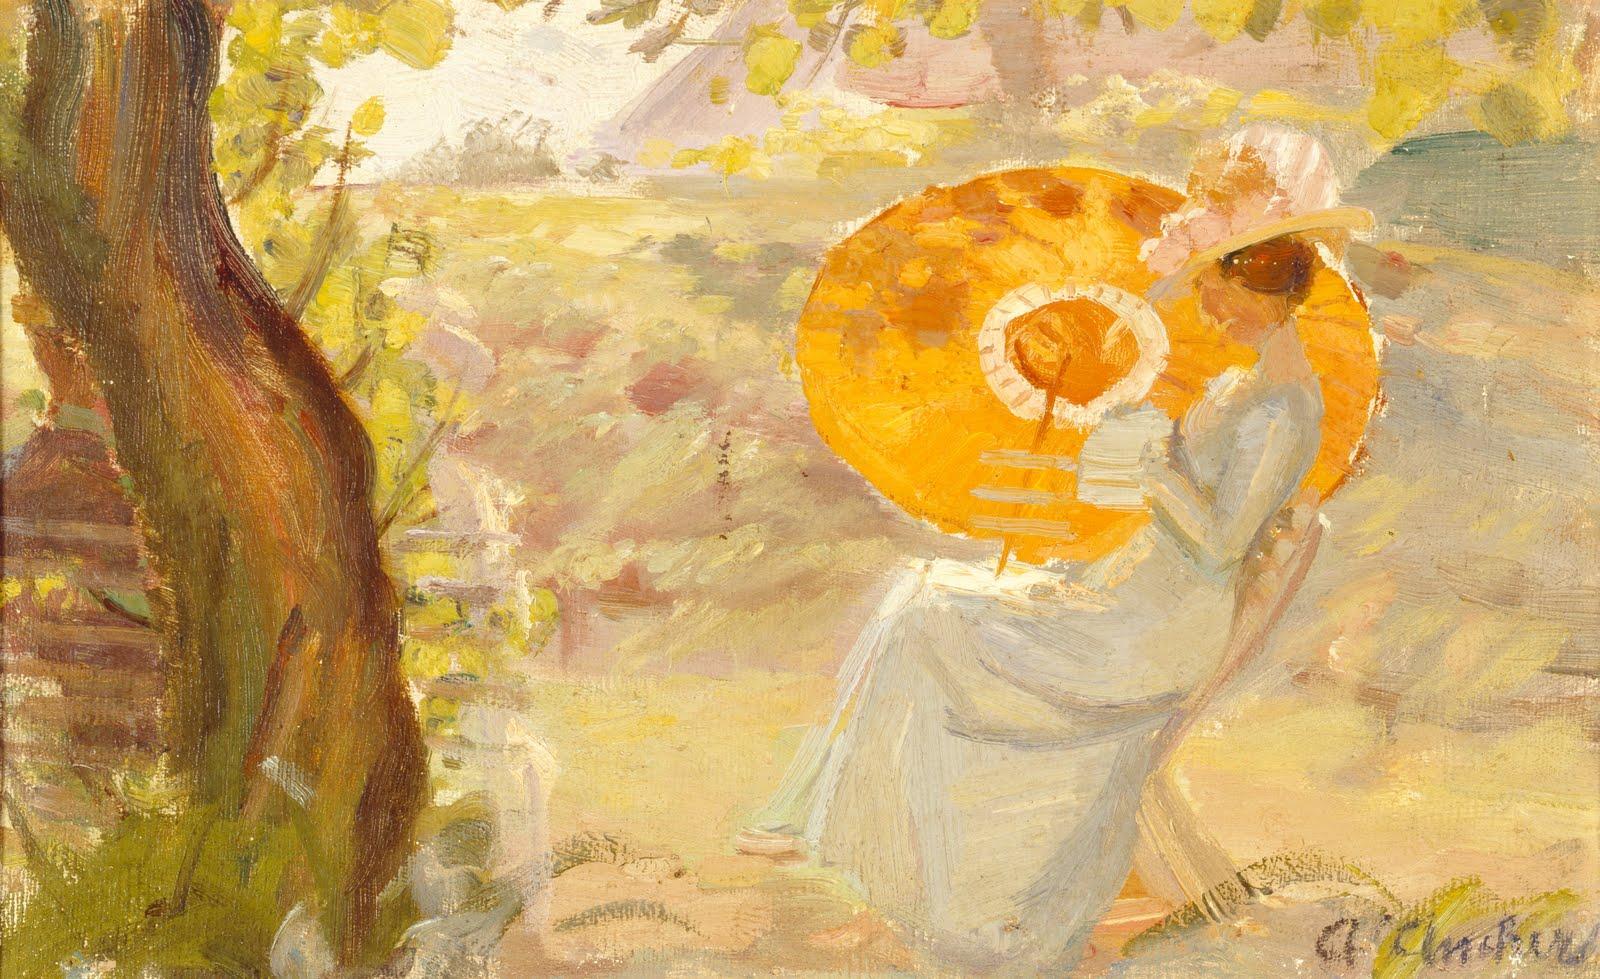 fileyoung girl in a garden with orange umbrella anna ancherjpg - The Girls In The Garden